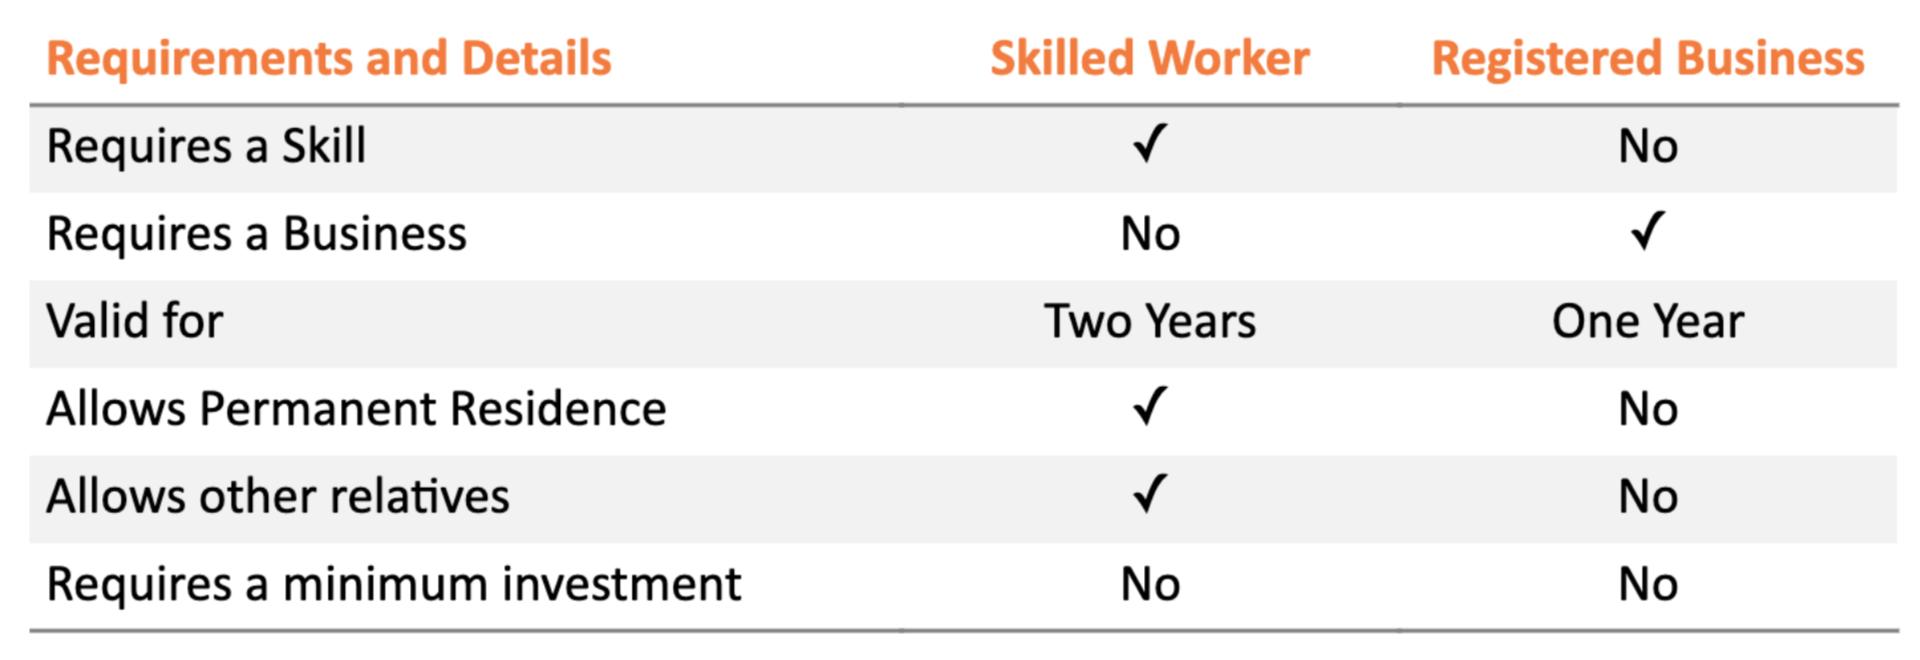 Skilled Worker vs Registered Business